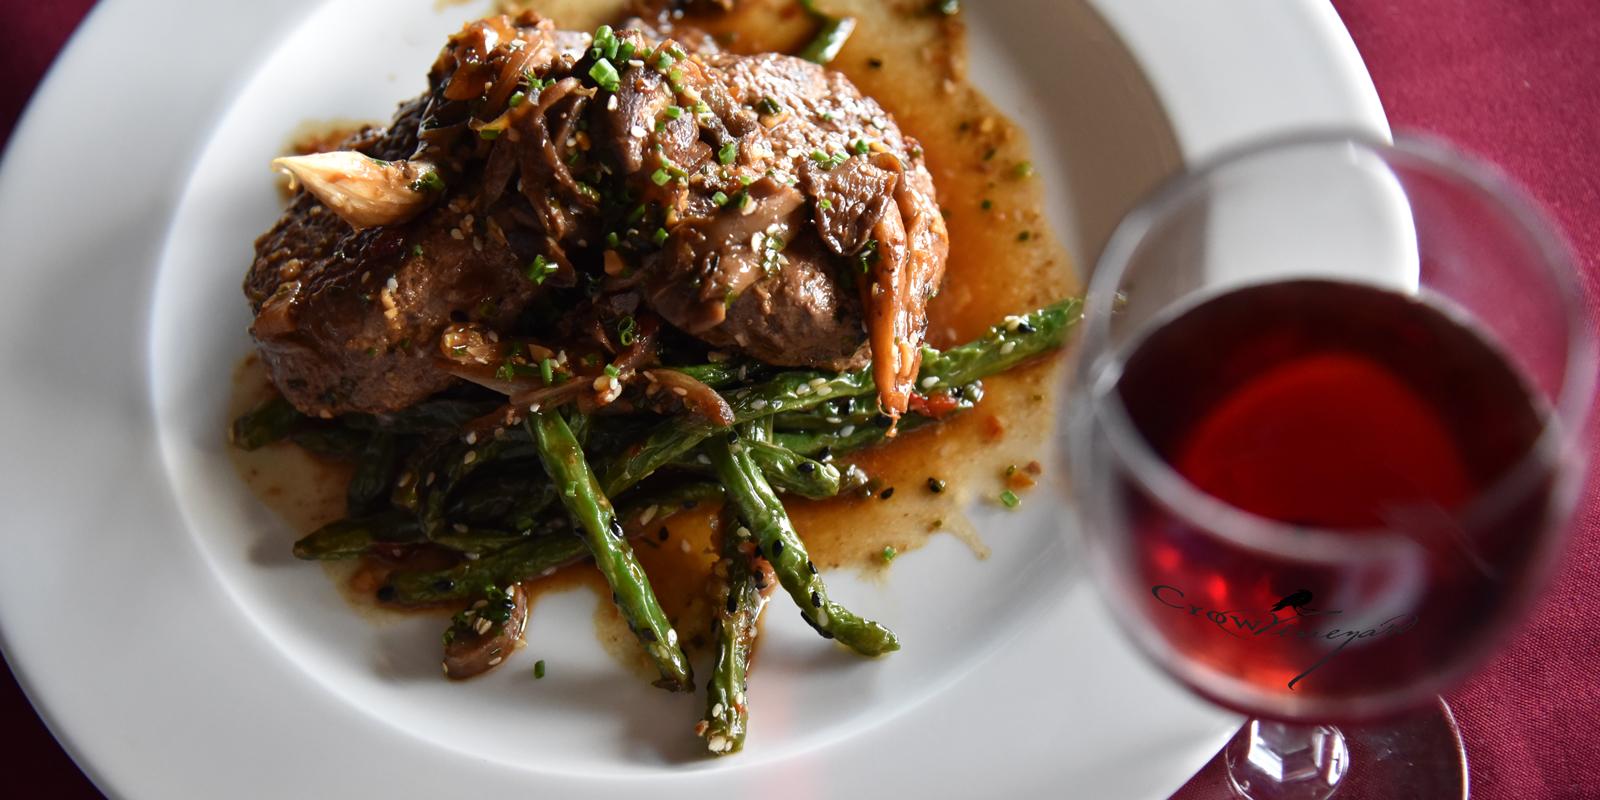 Crow Food and Wine Pairings